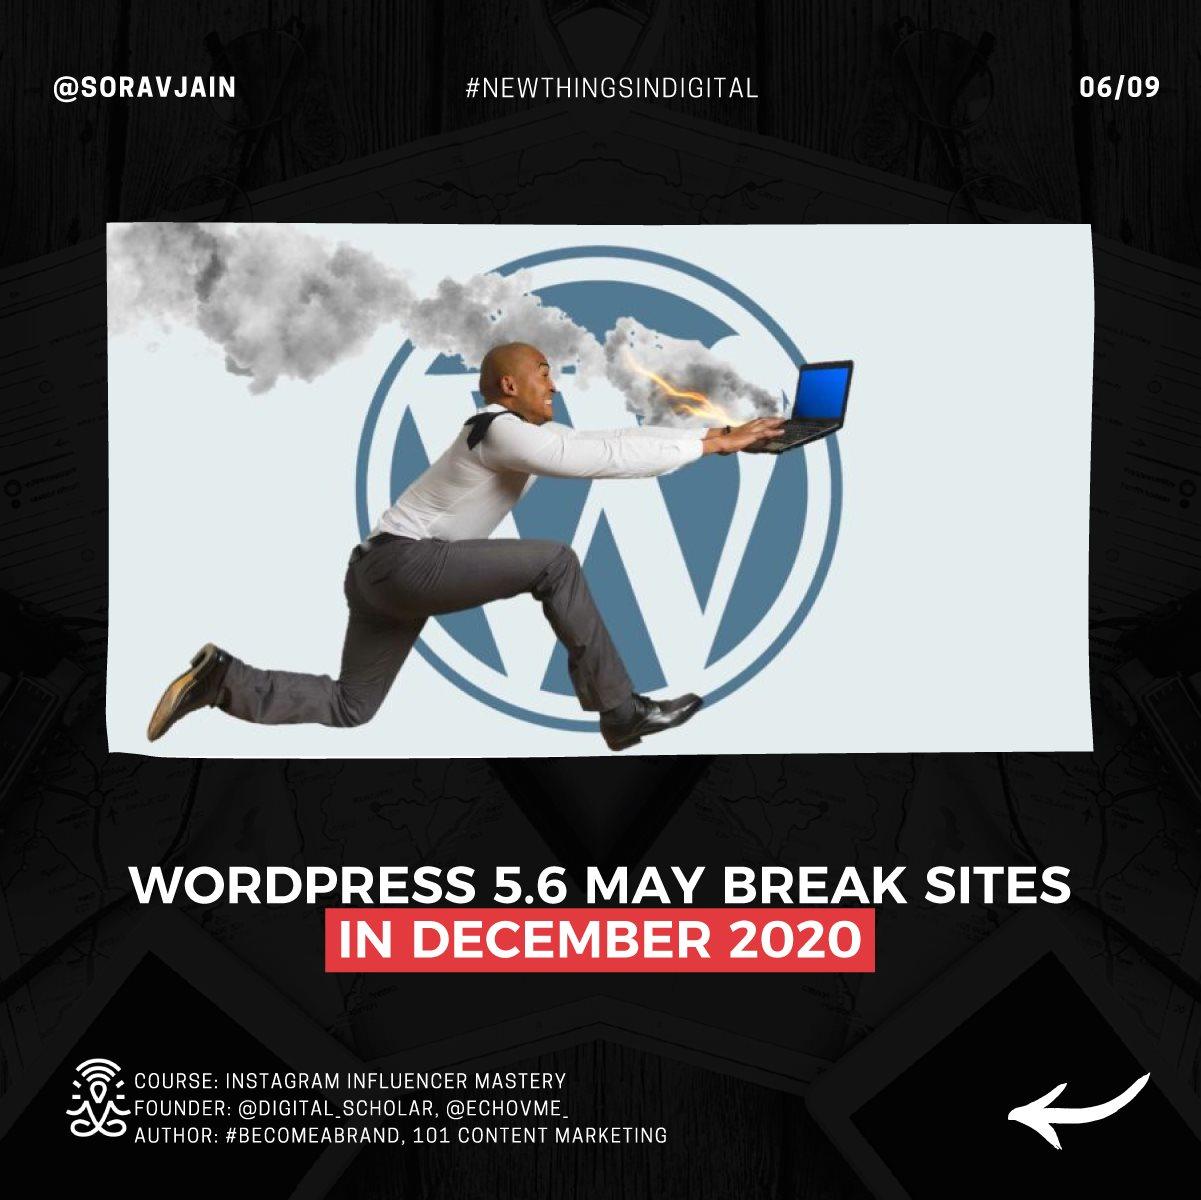 WordPress 5.6 May Break Sites in December 2020